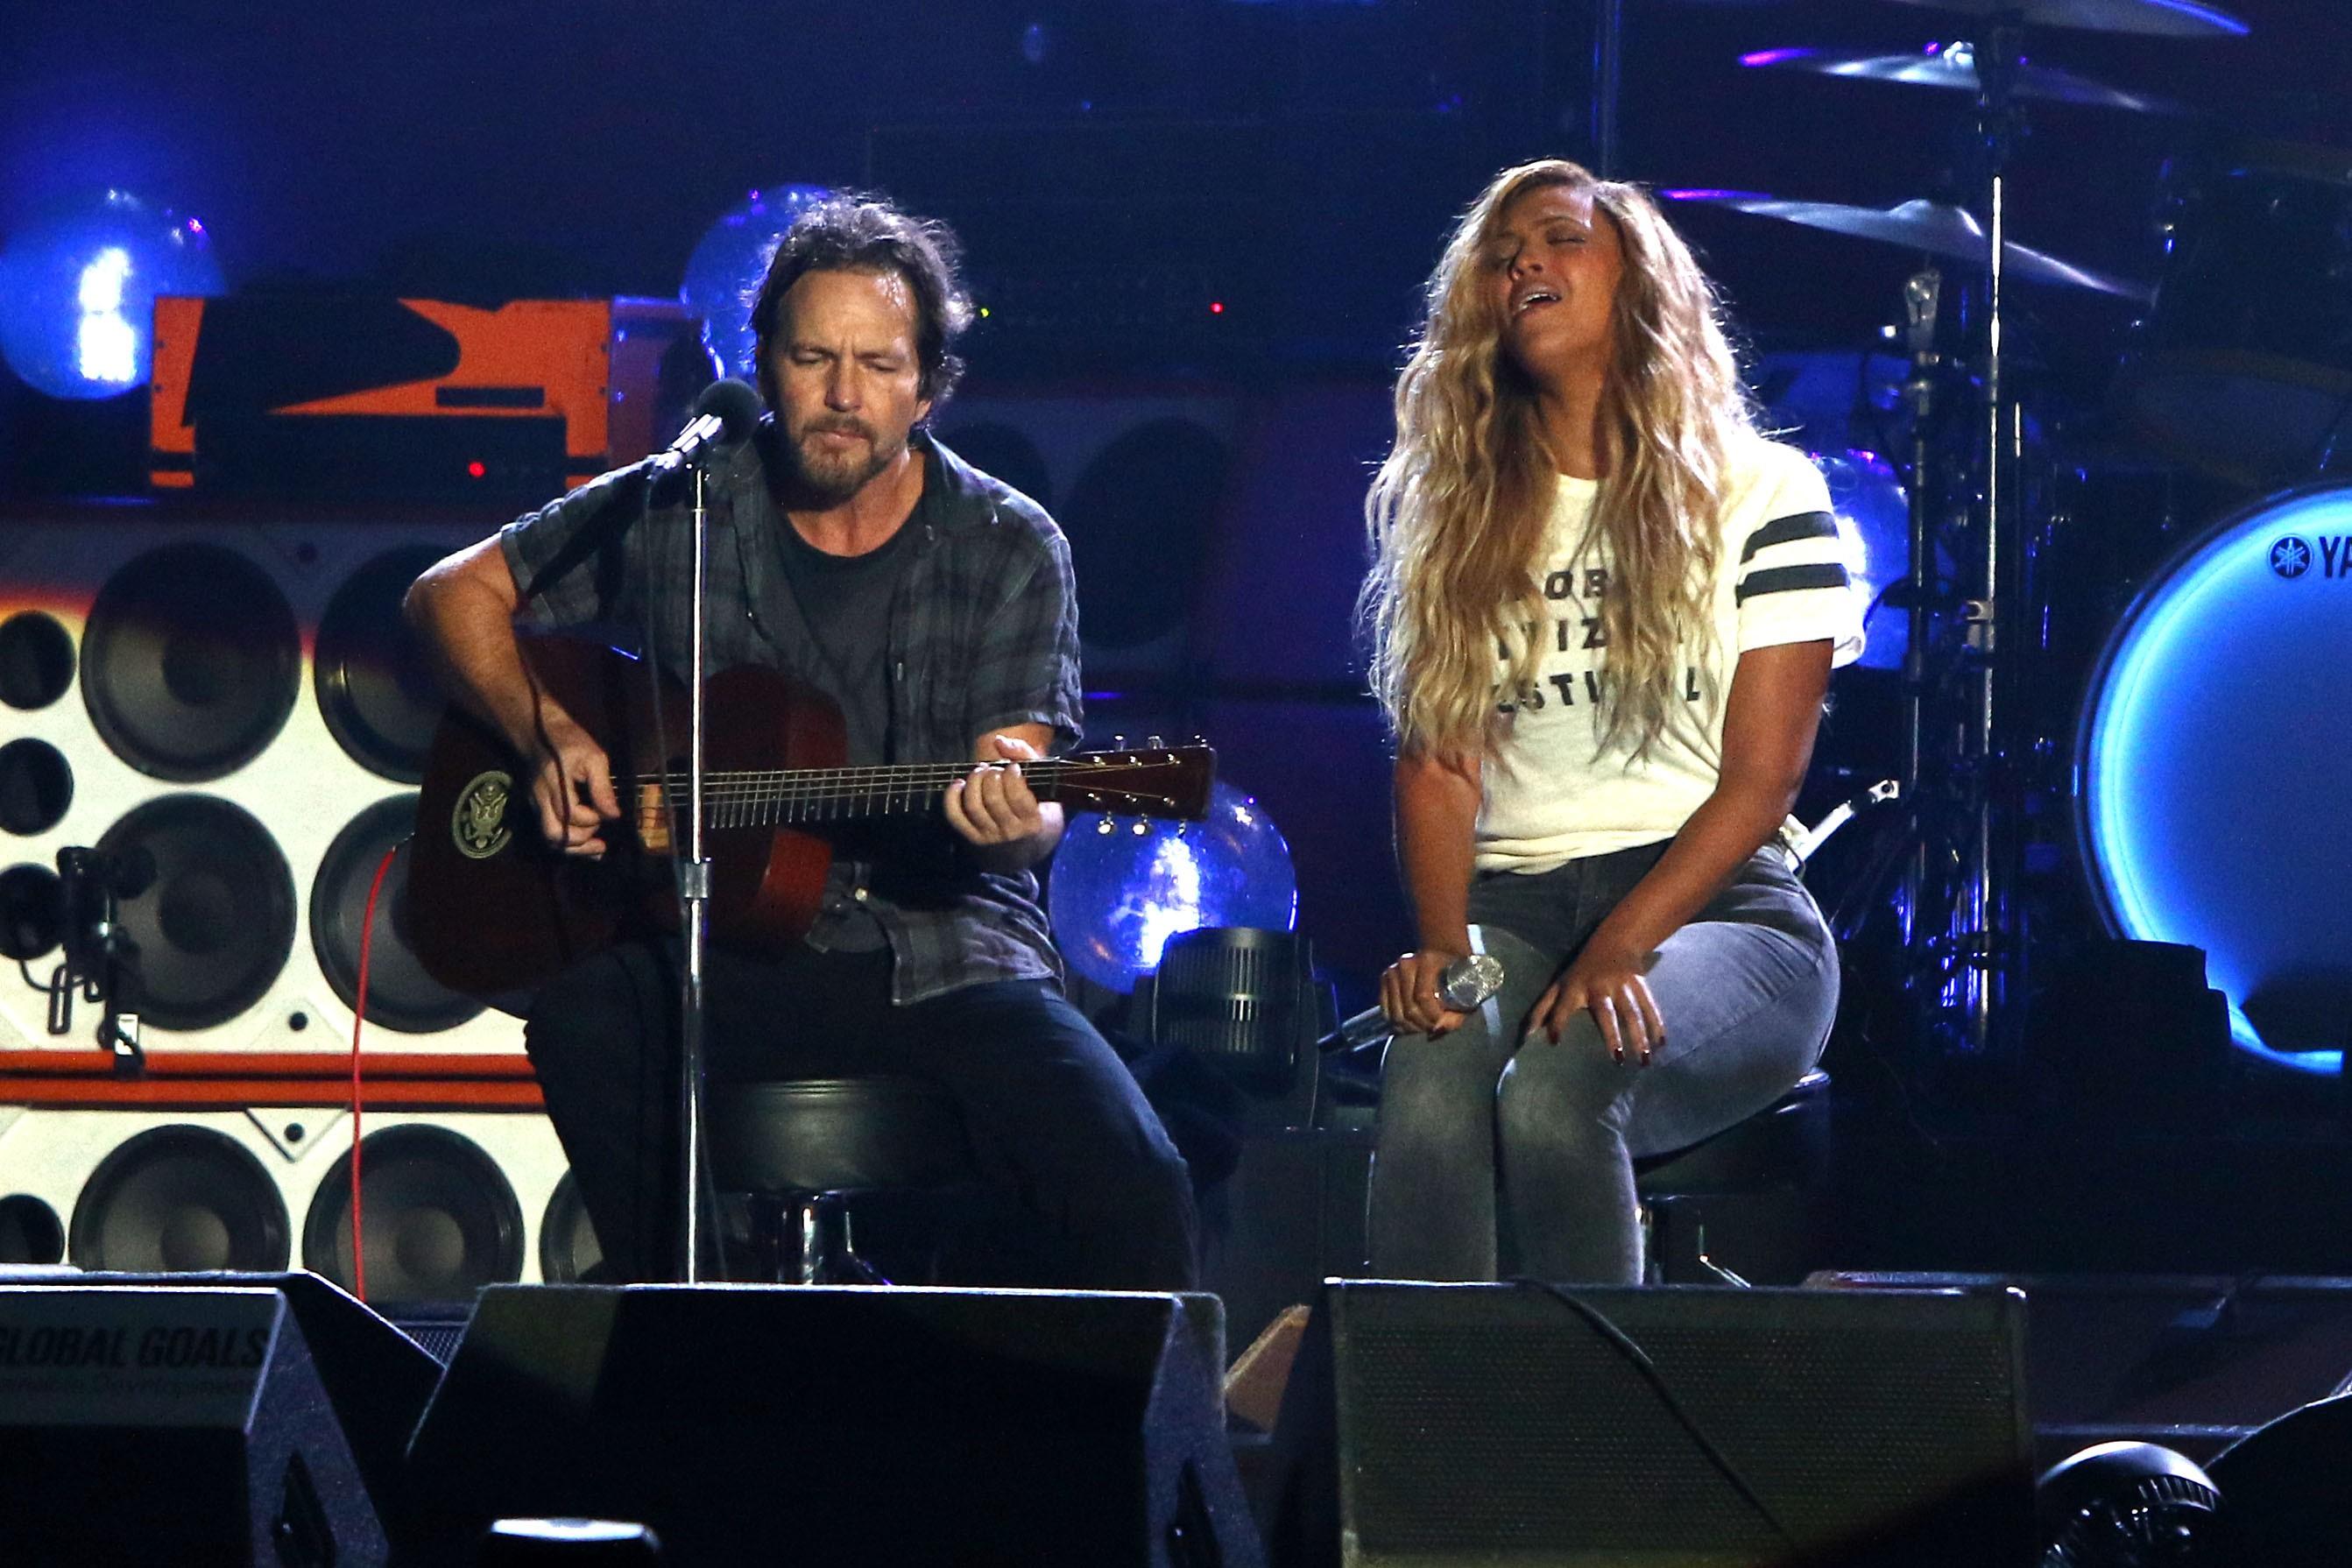 Eddie Vedder e Beyonc, no show beneficente em que 'Redemption Song' foi gravada (Foto: Greg Allen/Invision/AP)